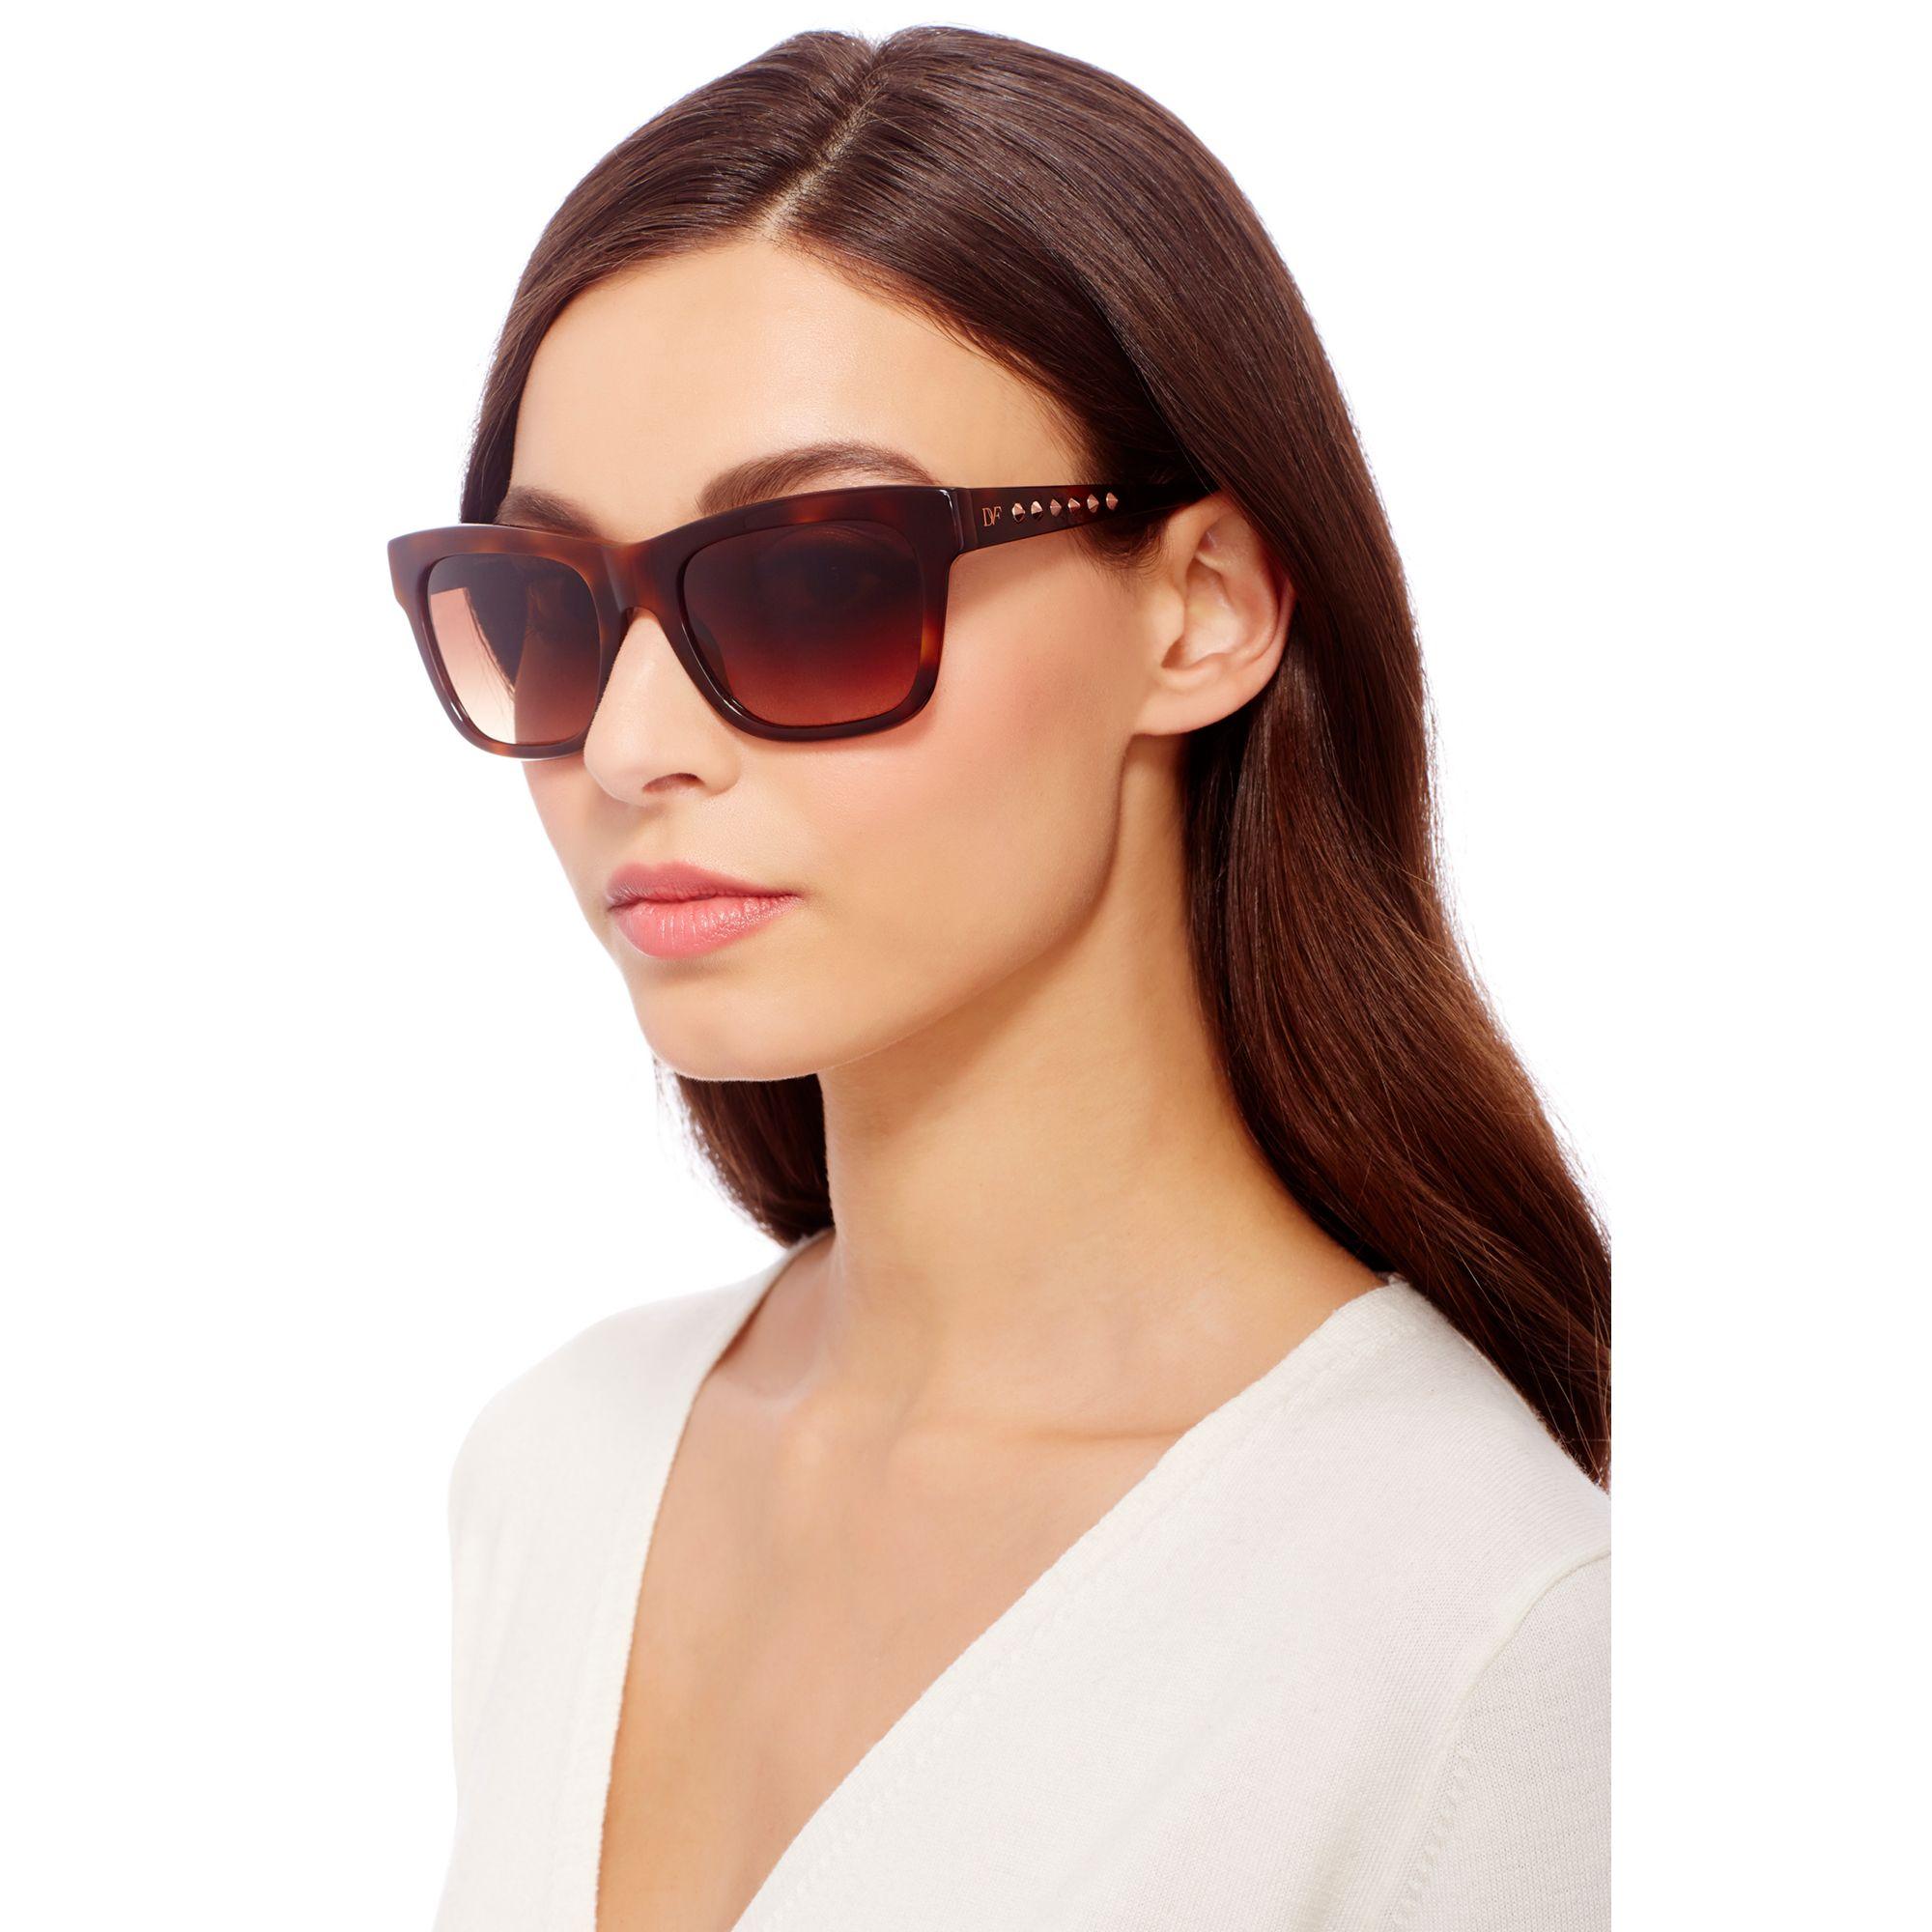 844e32df4 Diane von Furstenberg Leah Studded Sunglasses in Brown - Lyst